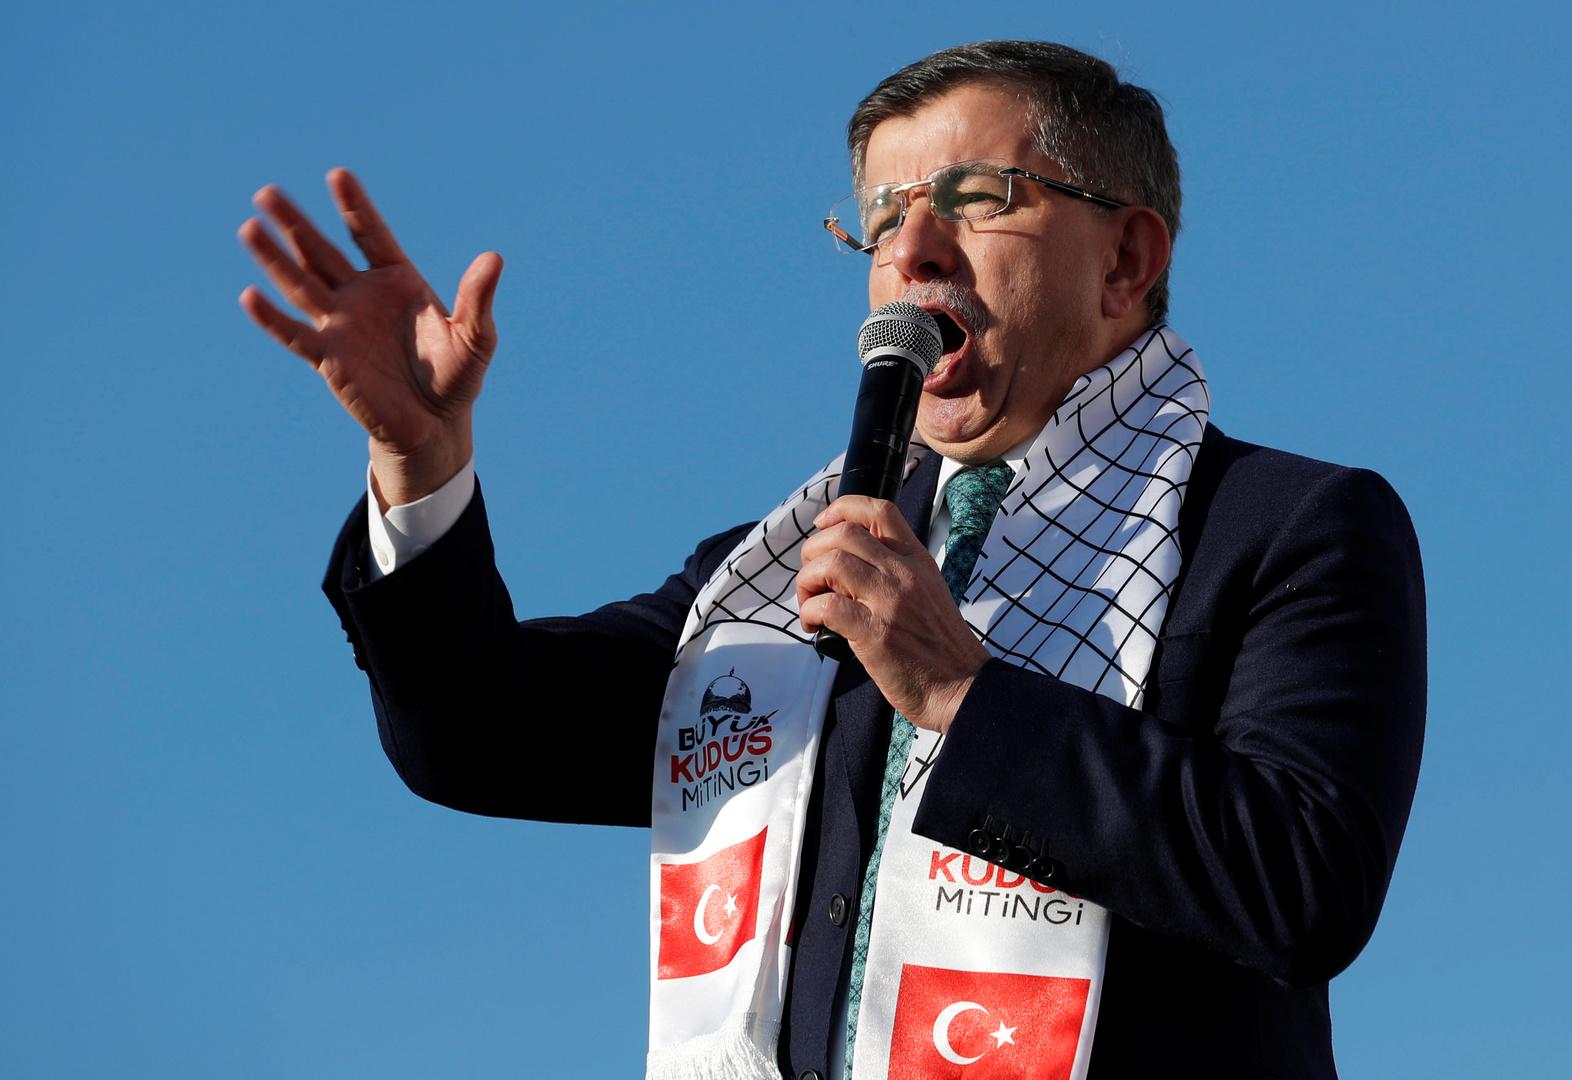 داوود أوغلو يدعو إلى محاسبة أردوغان